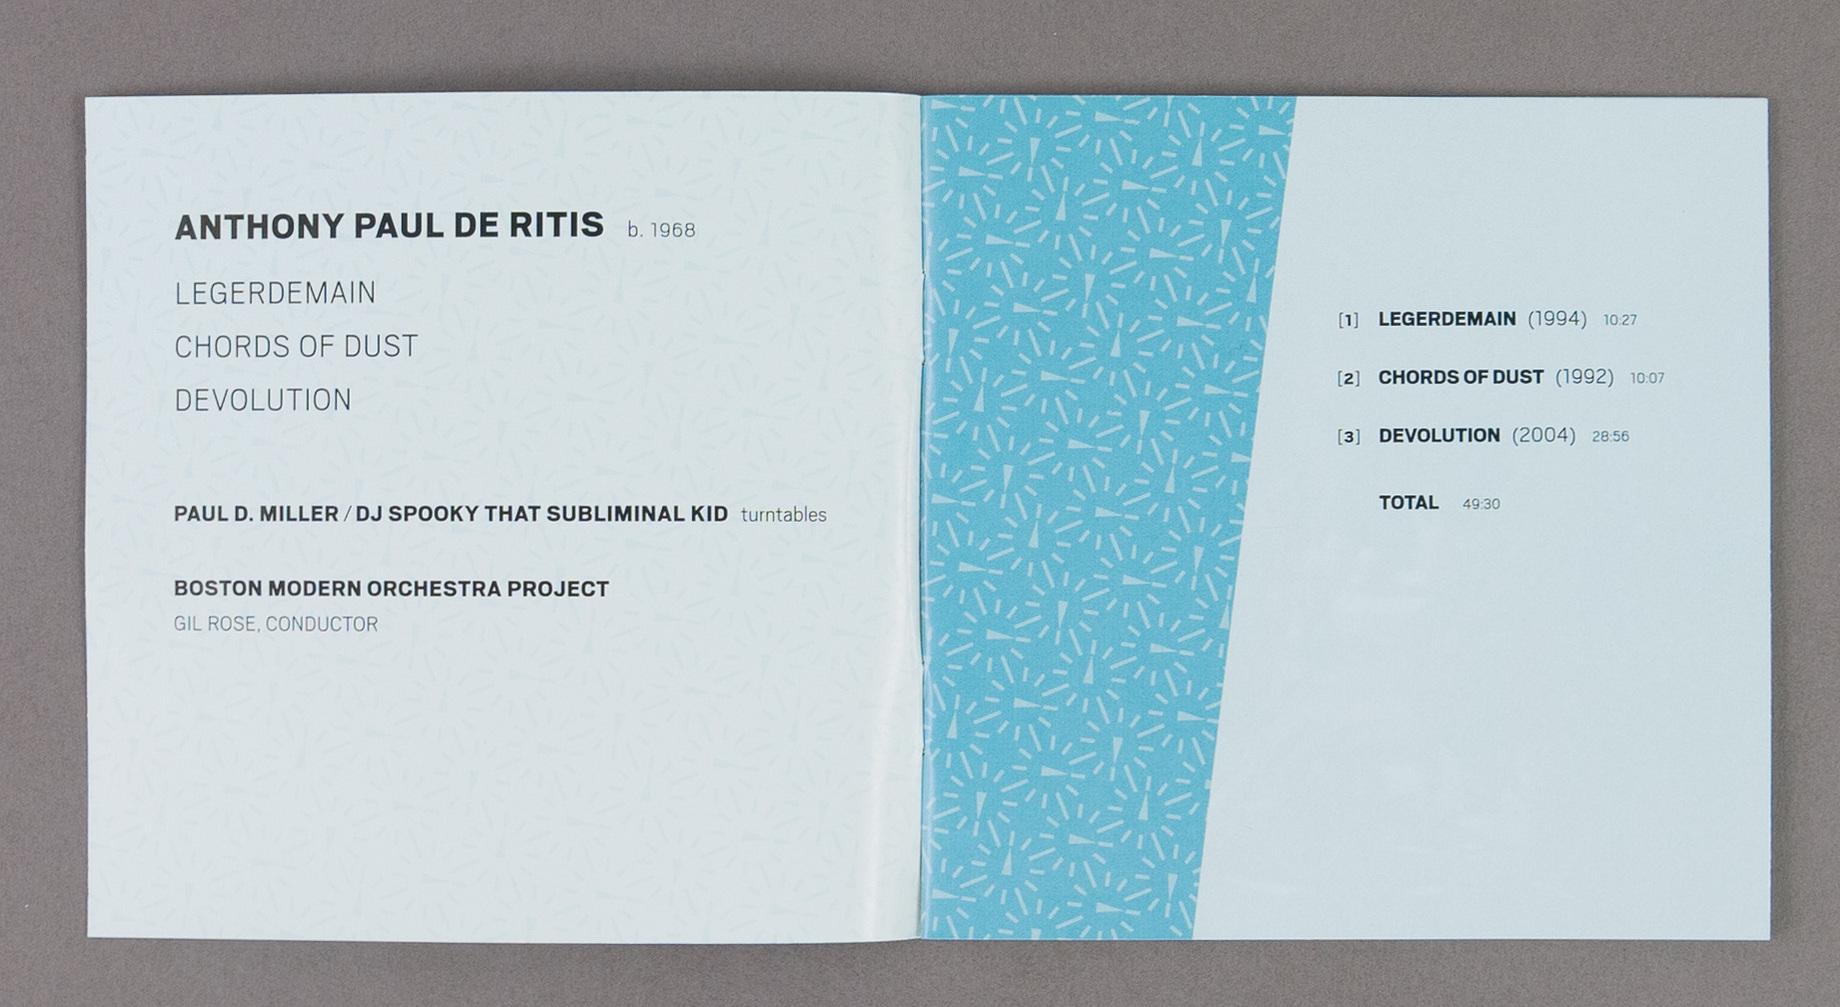 John Kramer Design | BMOP/Sound cd 1022: Anthony Paul De